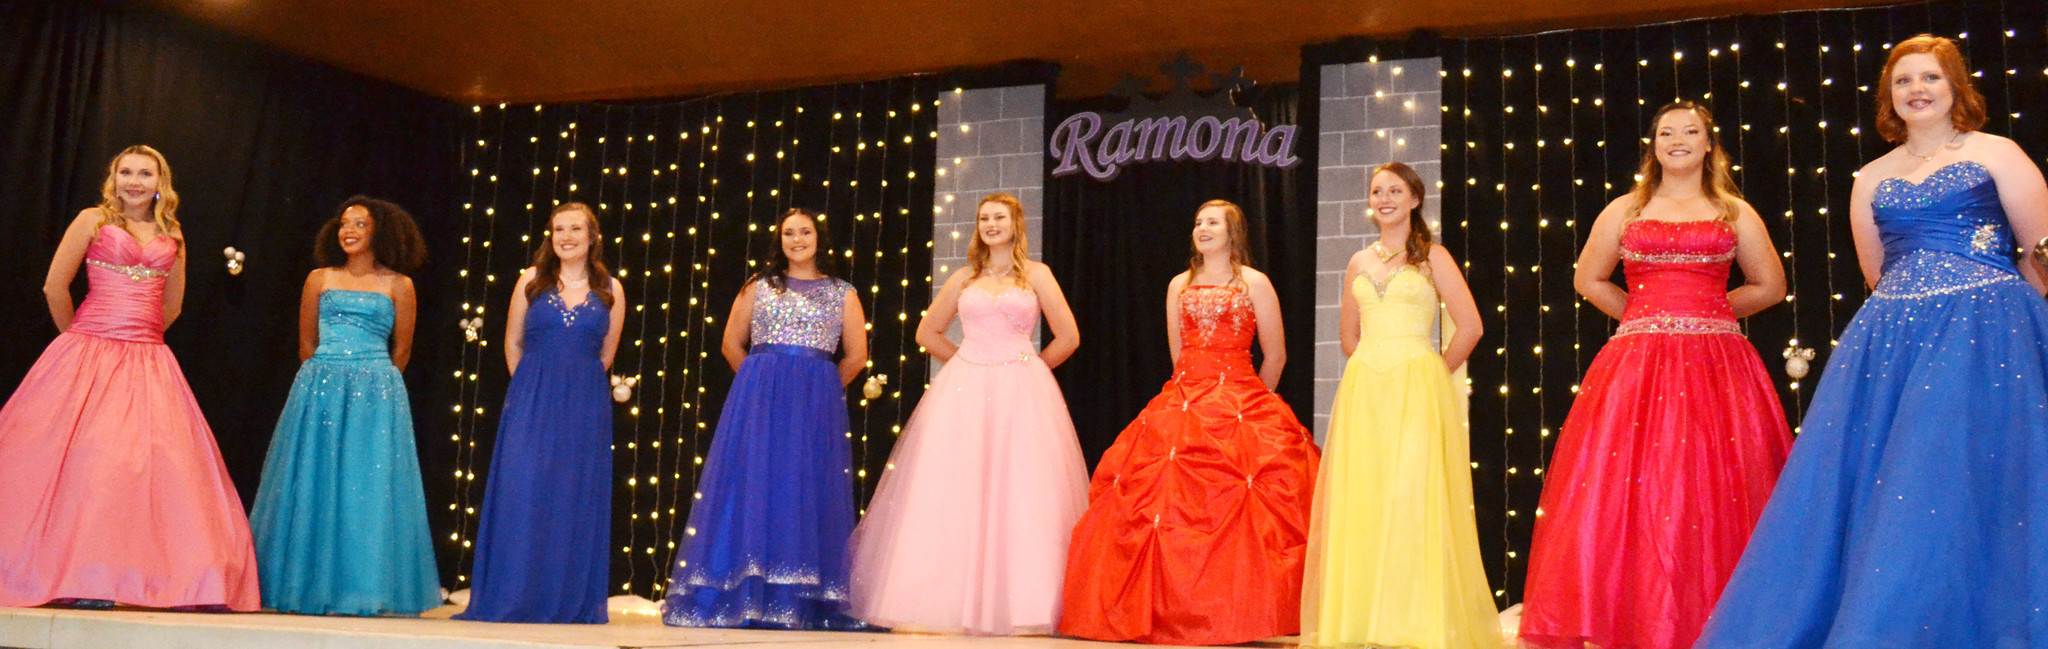 Teen Miss contestants present themselves in evening gowns. From left: Kamryn Jordan, Erika Bradley, Reigan Pozek, Cheyenne DePhillippis, Cheyenne Williams, Emily Bryant, MacKenzie Nolan, Sabrina Forehand, and Danielle Collins